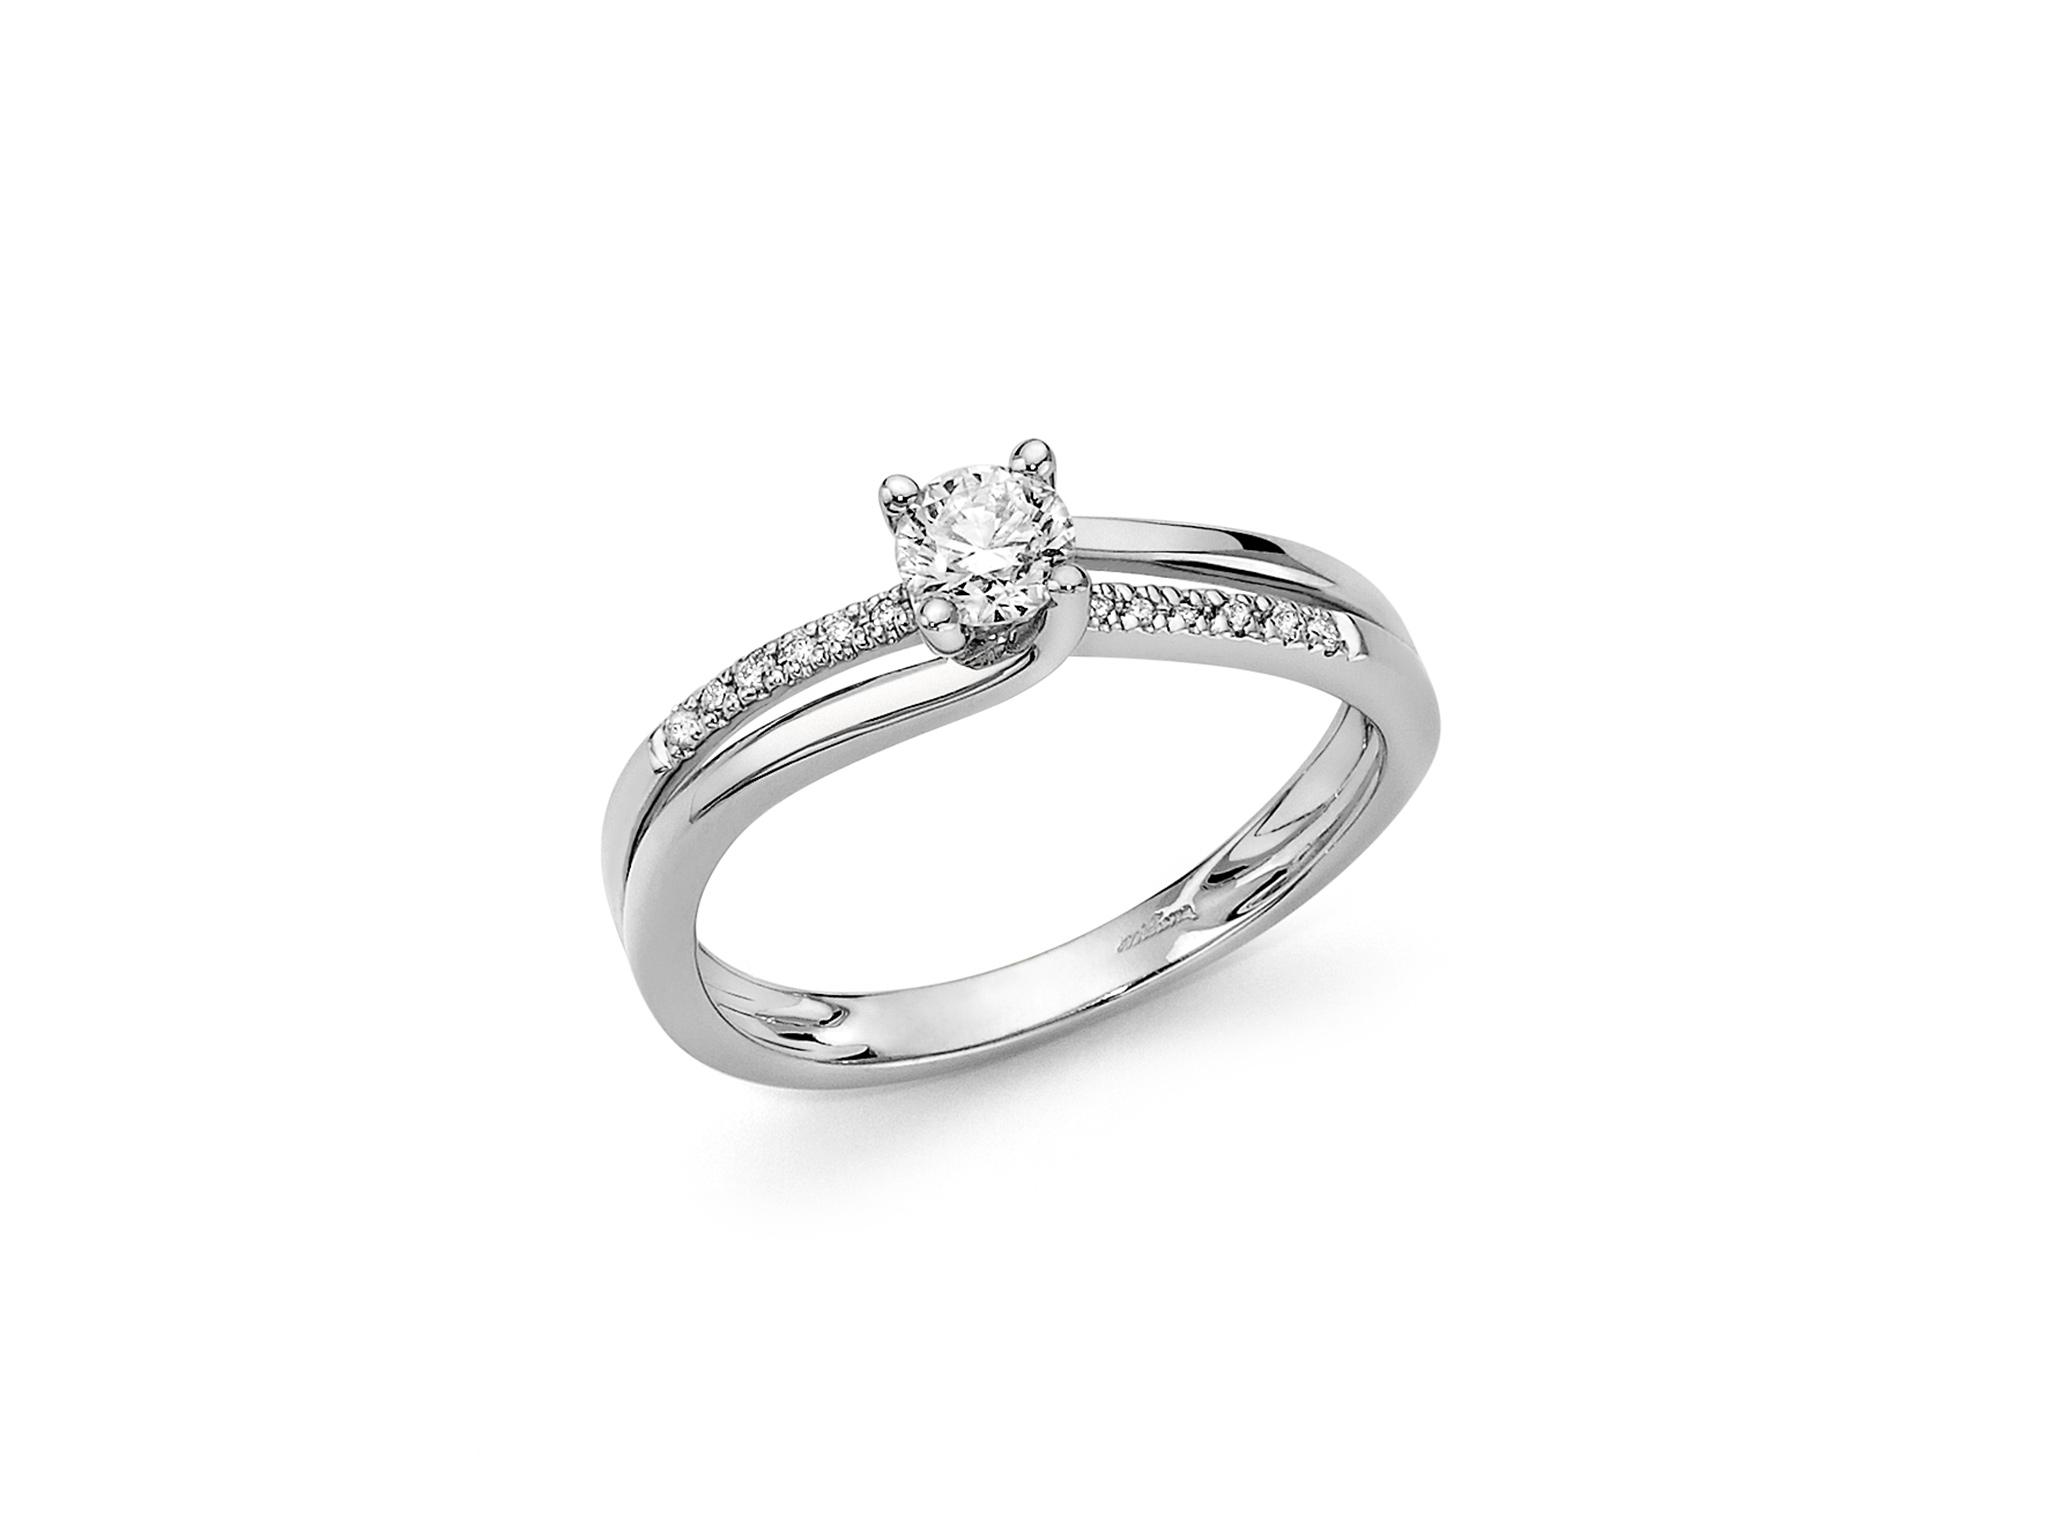 Solitario fantasia in oro e diamanti. - LID3302-030G7